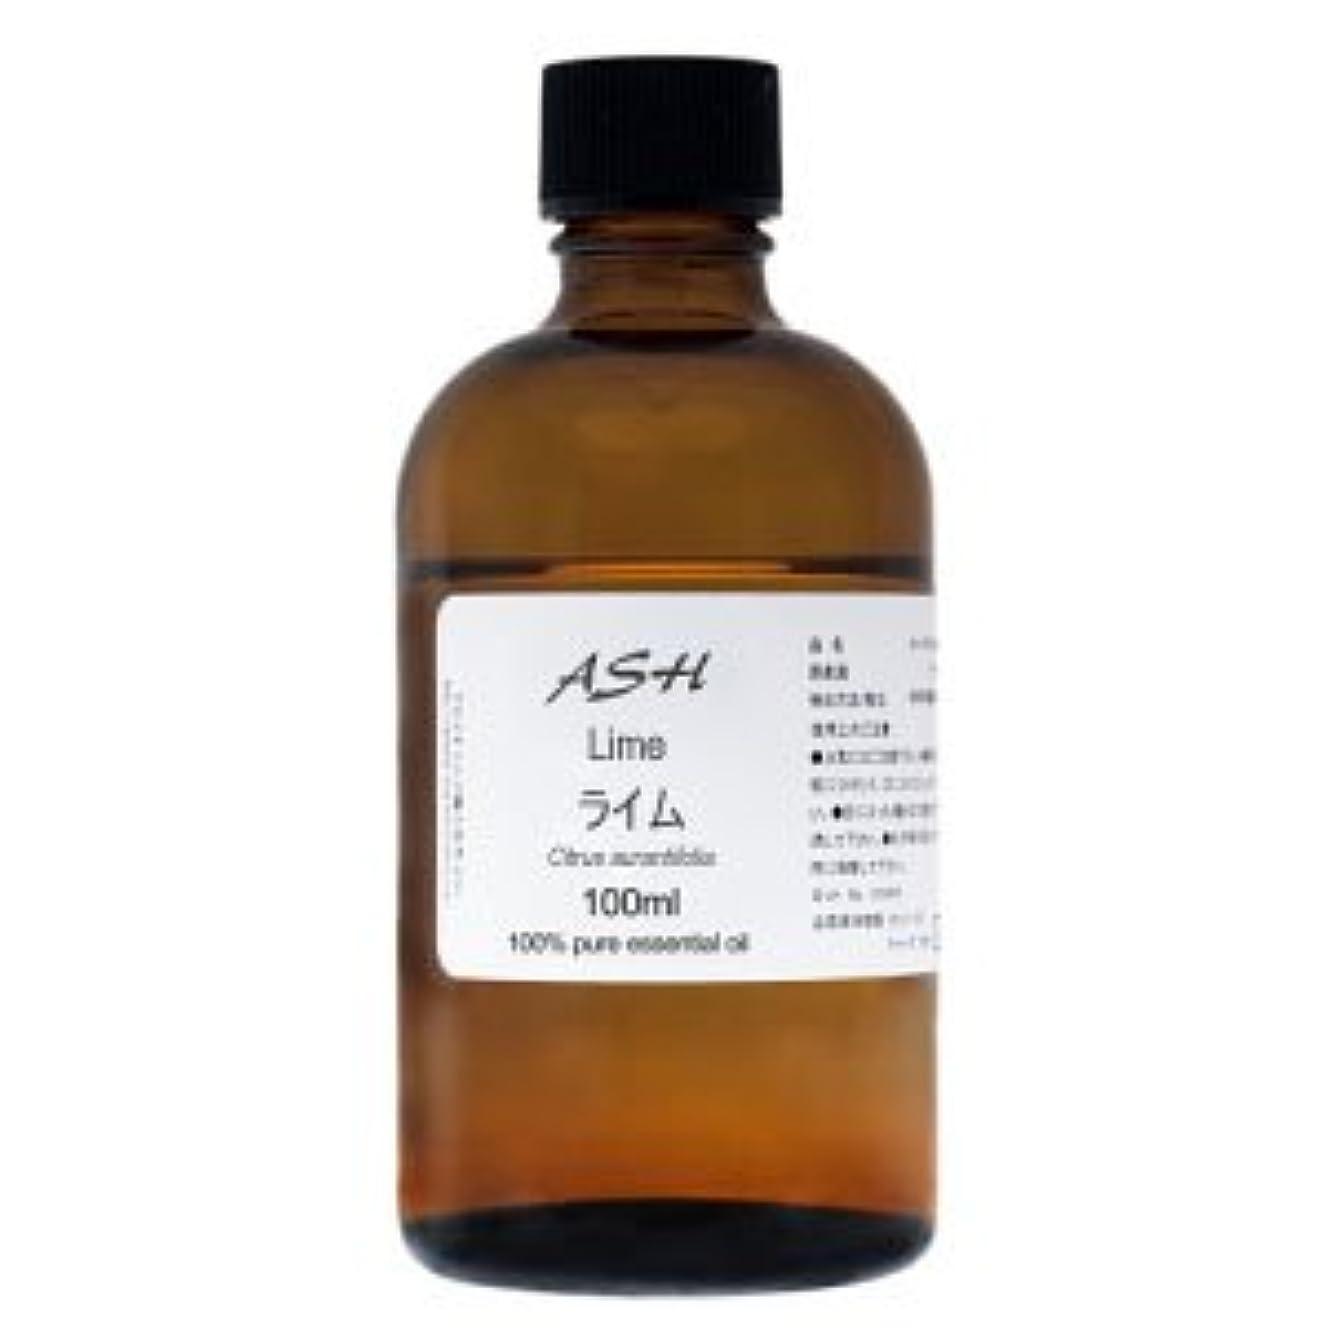 ASH ライム エッセンシャルオイル 100ml AEAJ表示基準適合認定精油